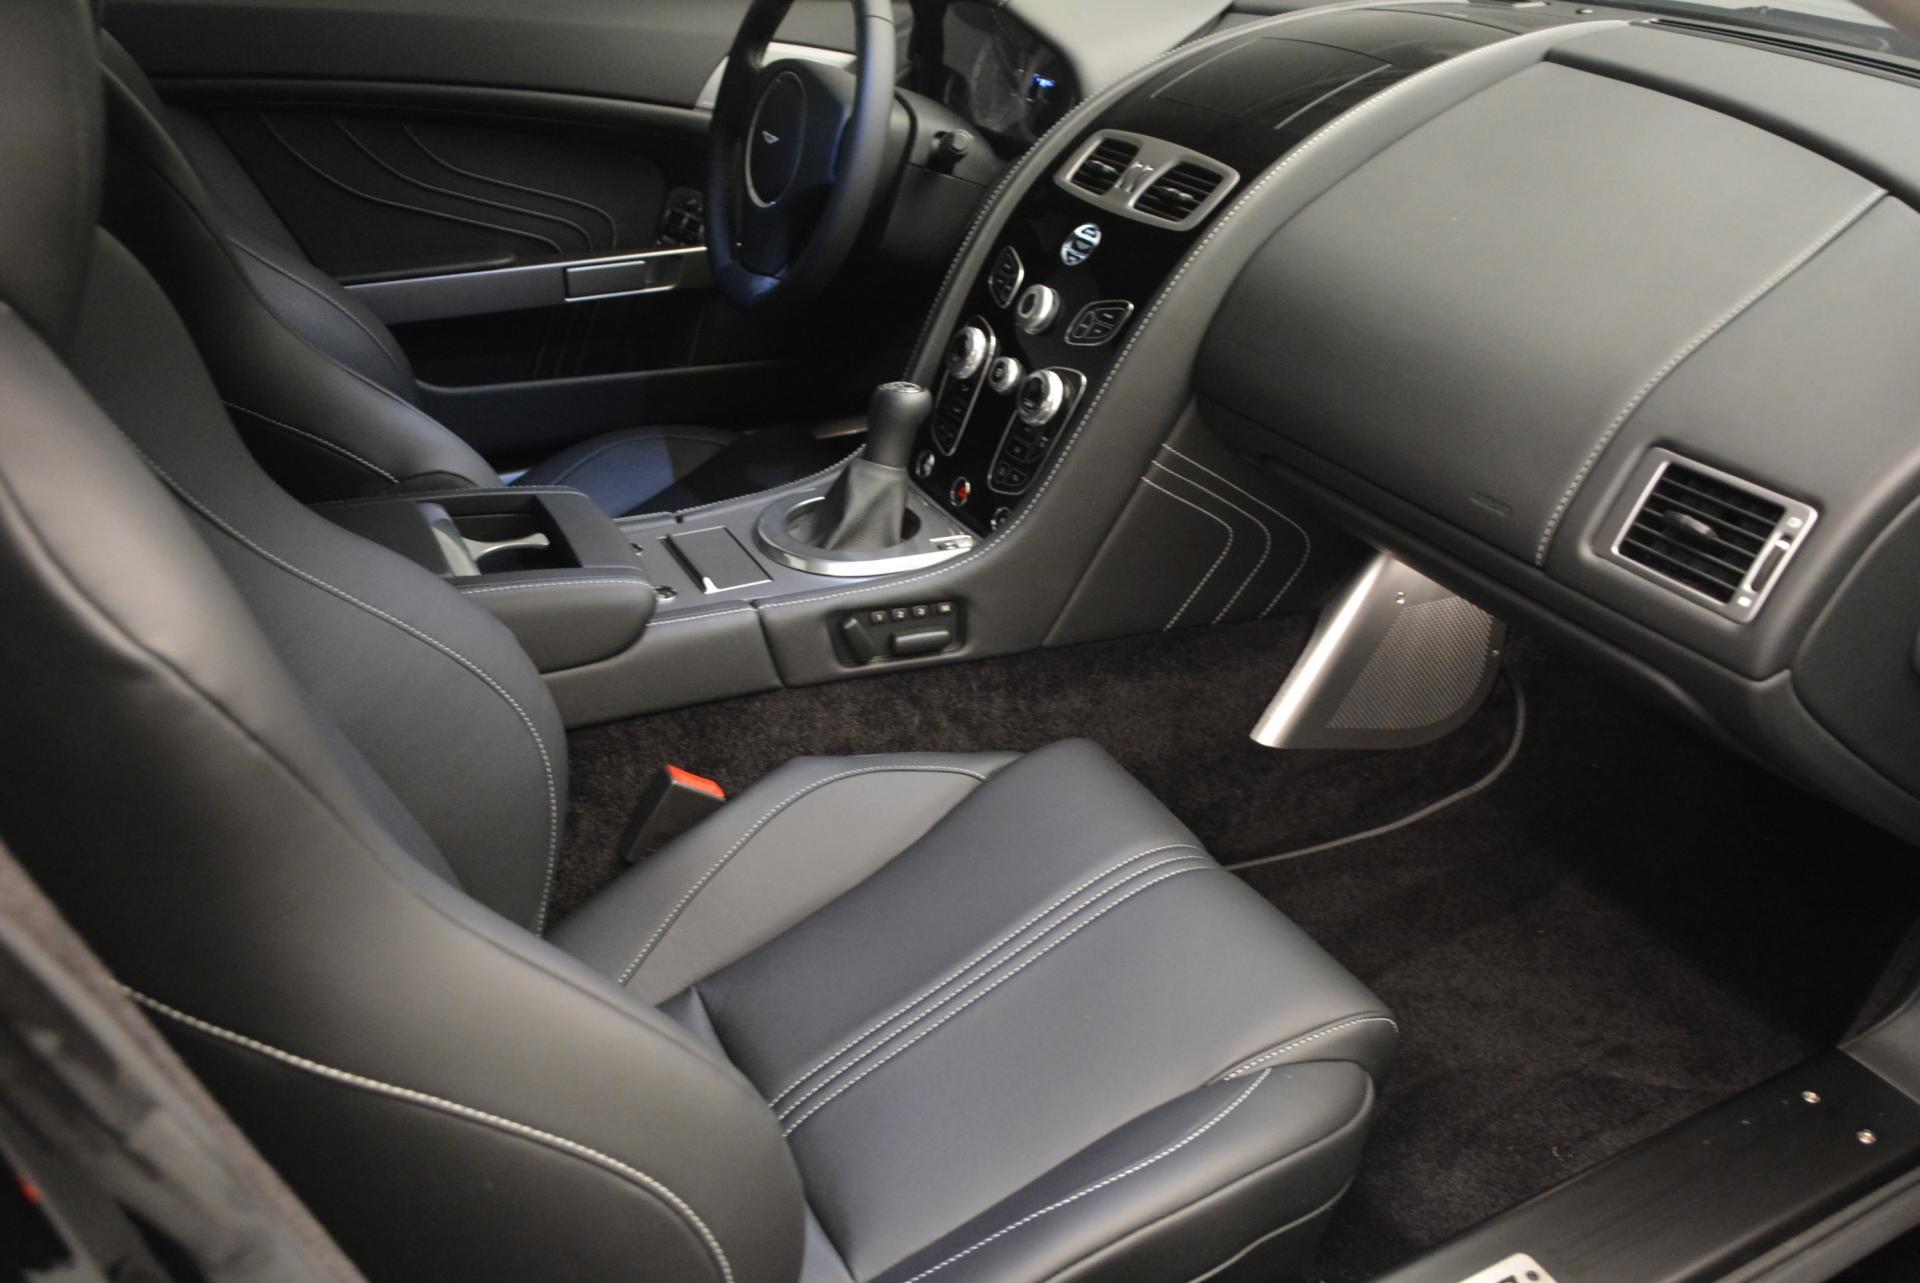 New 2016 Aston Martin V8 Vantage GTS S For Sale In Greenwich, CT 526_p18